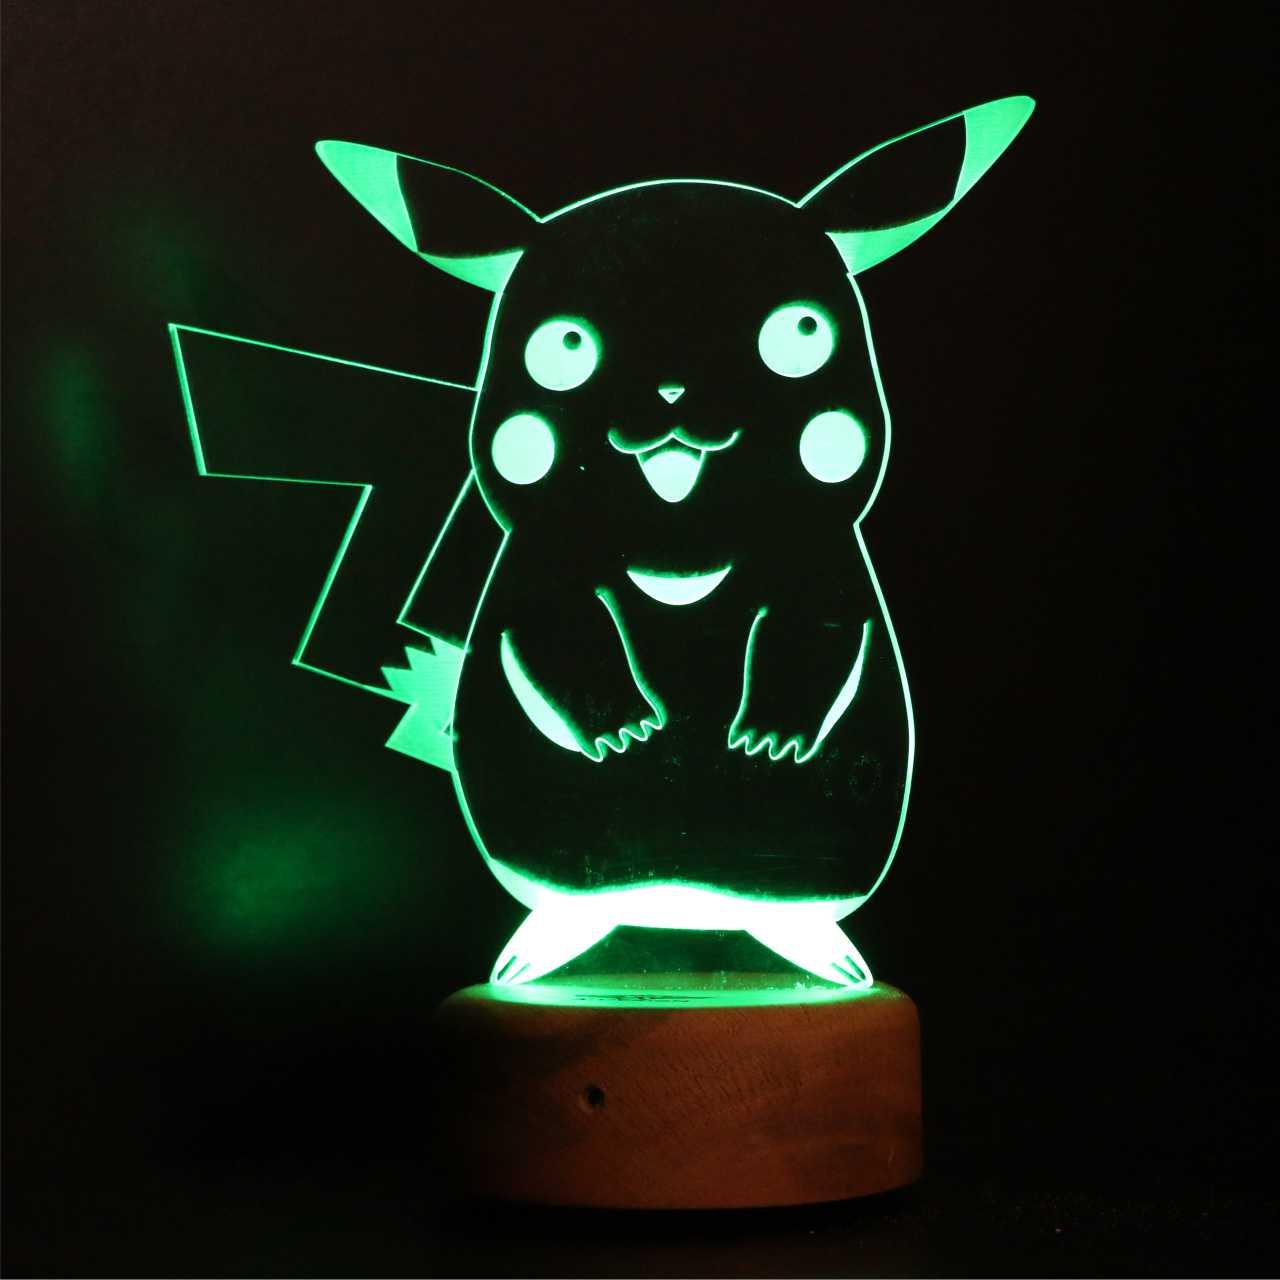 چراغ خواب ای پلاس دیزاین طرح دیجیمون